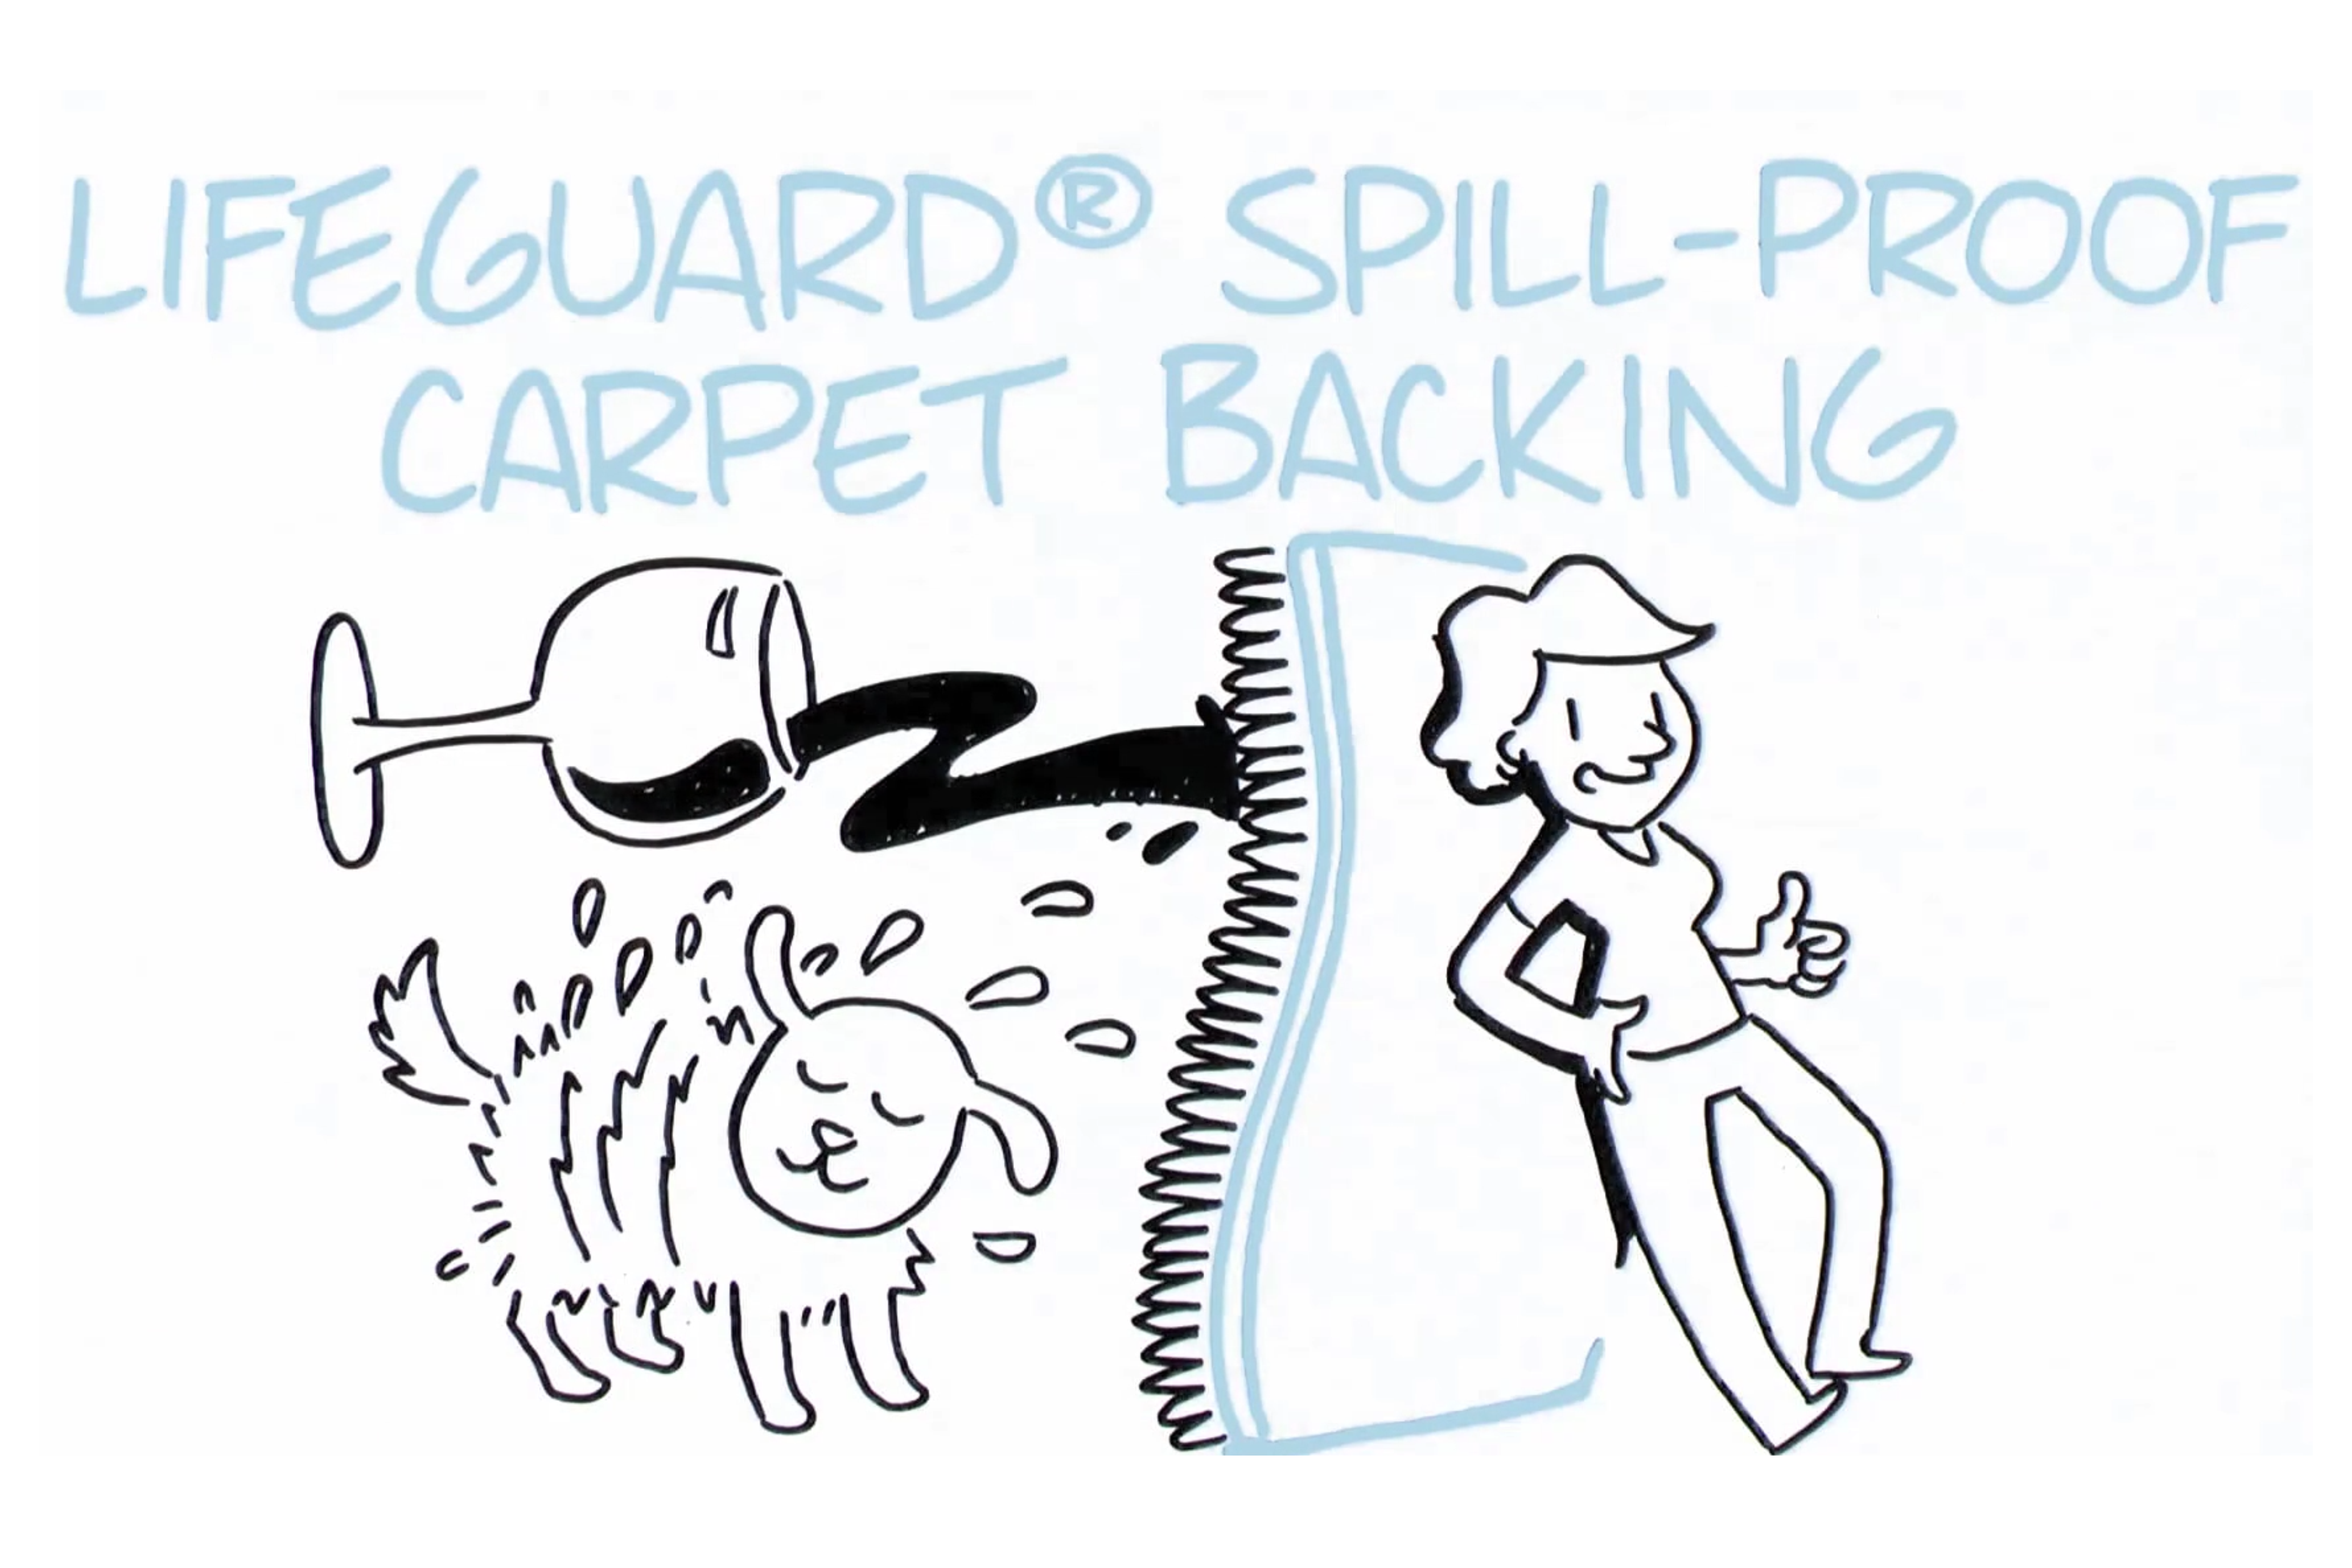 Thumbnail - Shaw LifeGuard spill-proof carpet backing